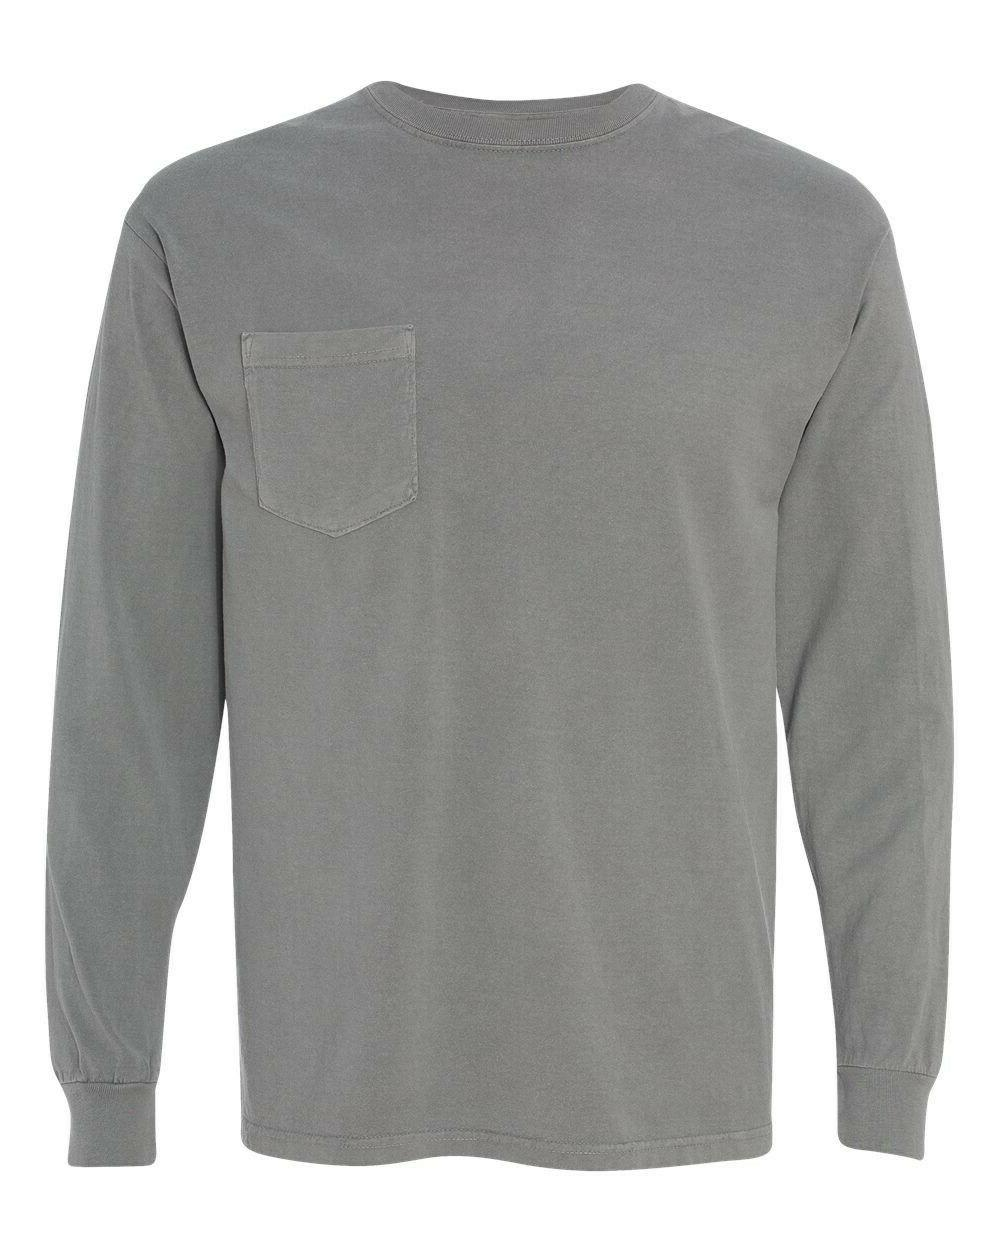 NWOT Set of 2 LONG sleeve Comfort Colors POCKET tees size L: